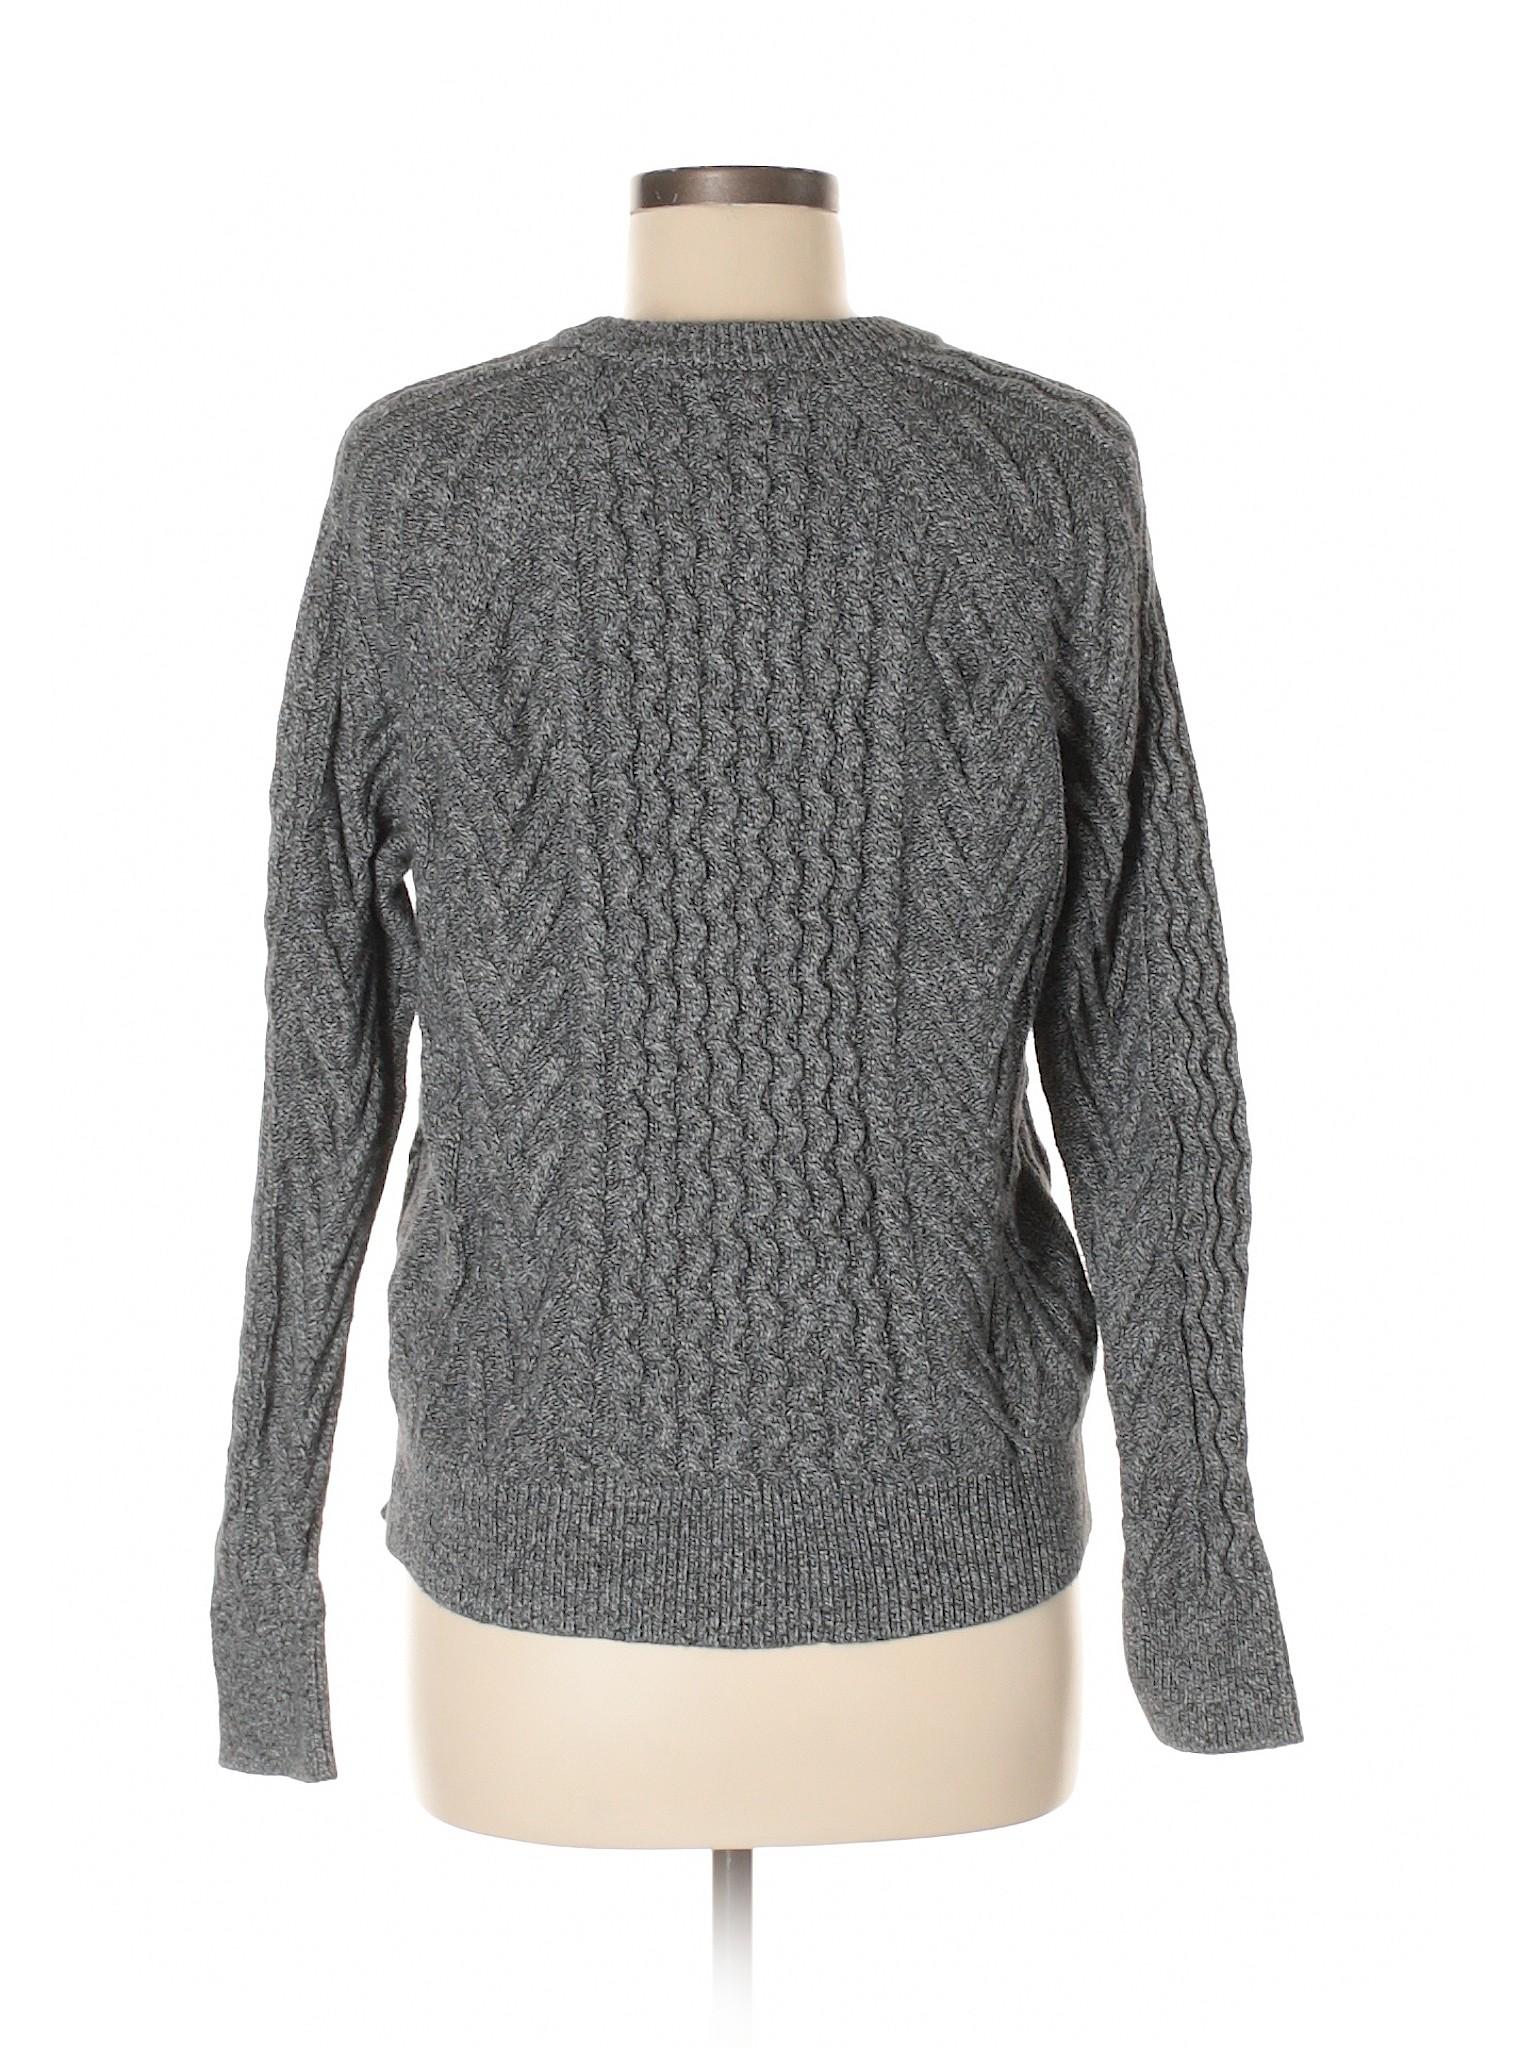 Boutique Pullover Boutique Gap Gap Sweater Pullover xSx8n7Ew